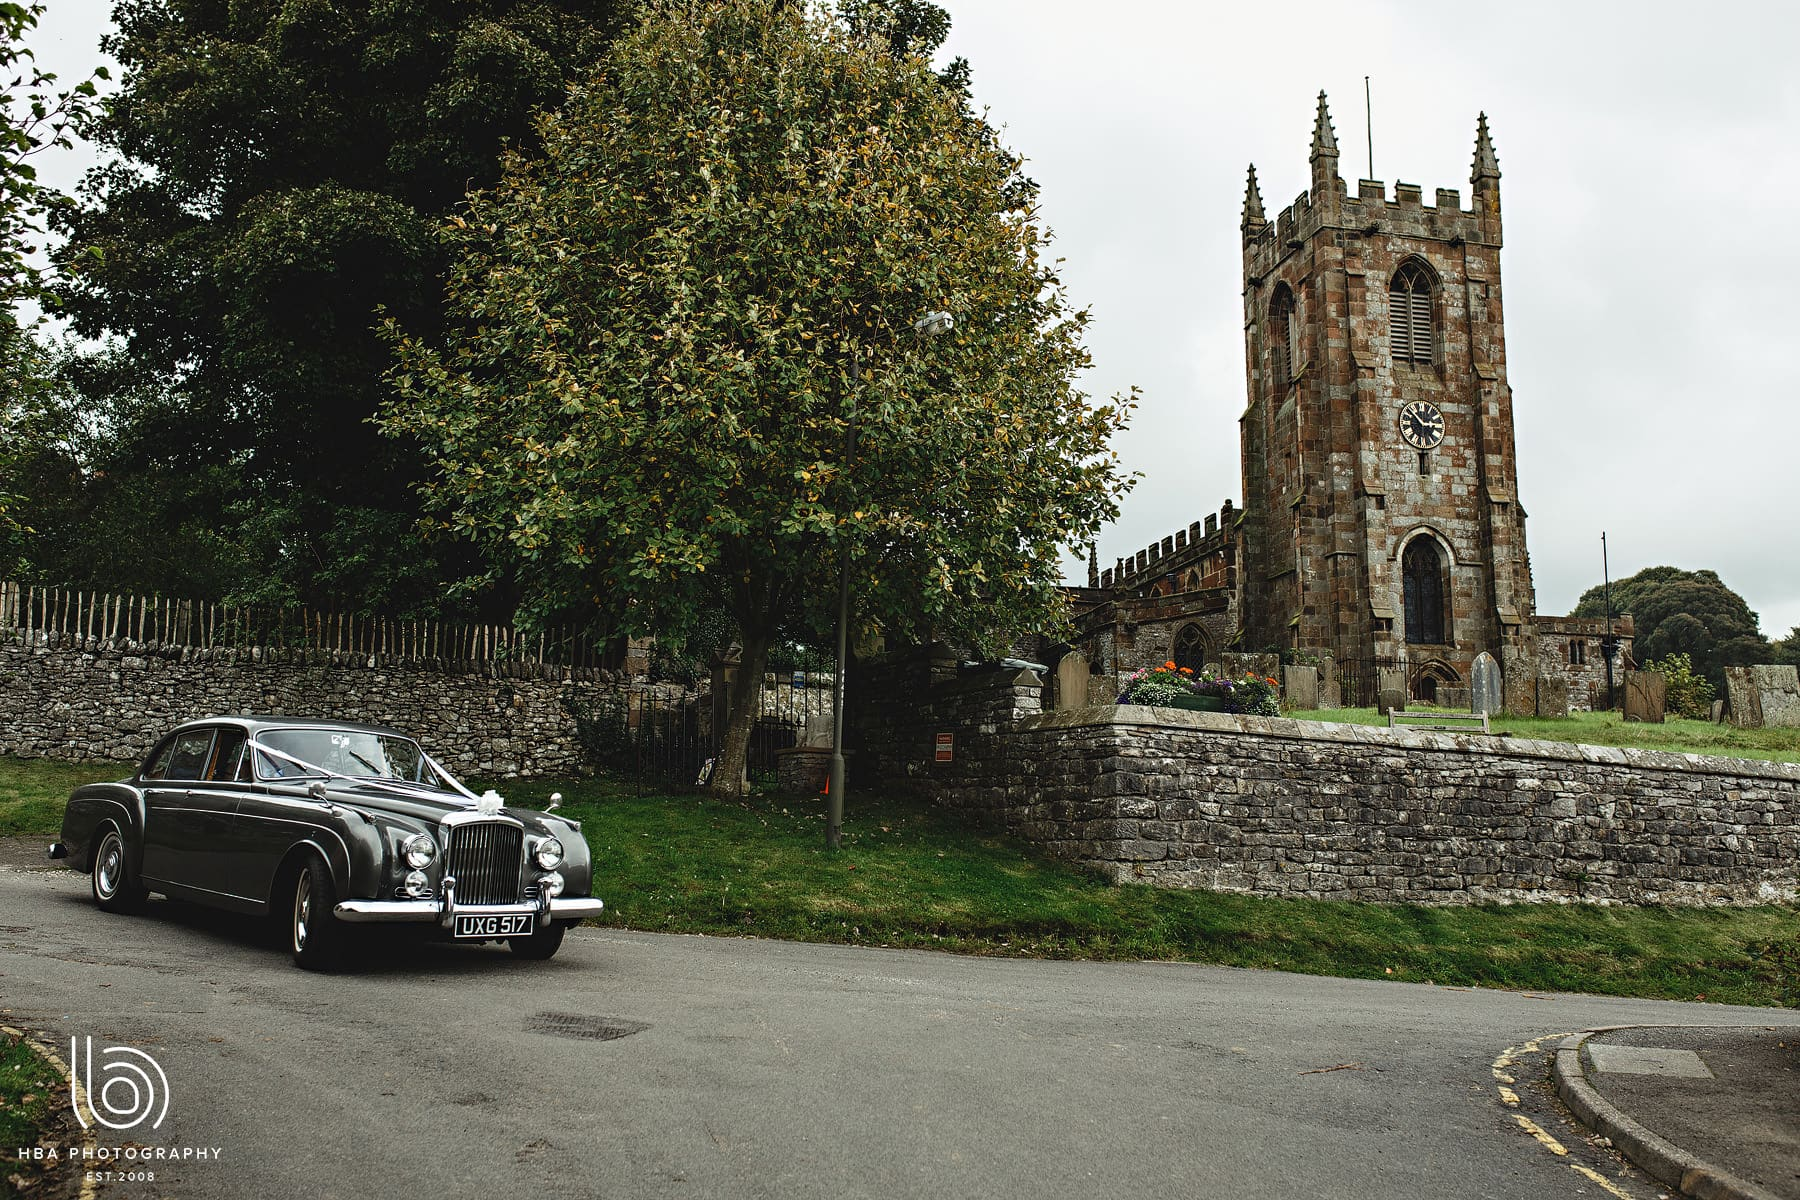 the weddin car at the church